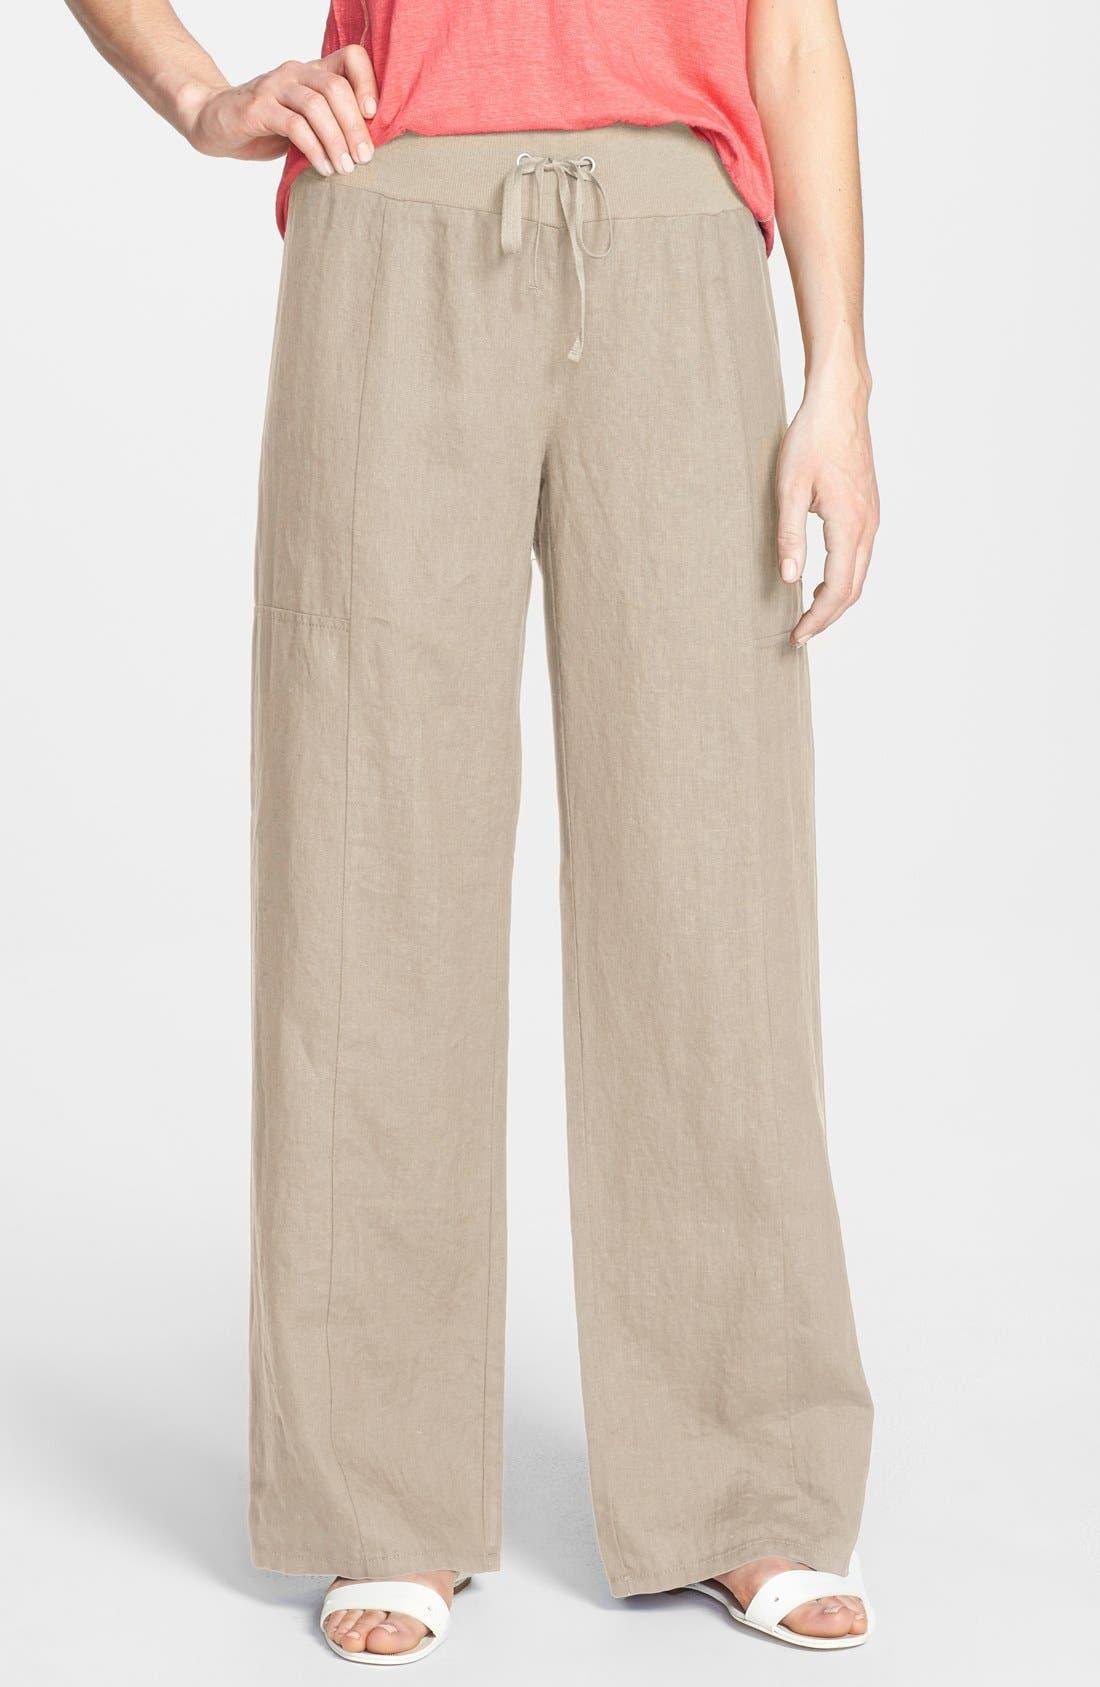 Alternate Image 1 Selected - Eileen Fisher Wide Leg Linen Pants (Regular & Petite) (Online Only)